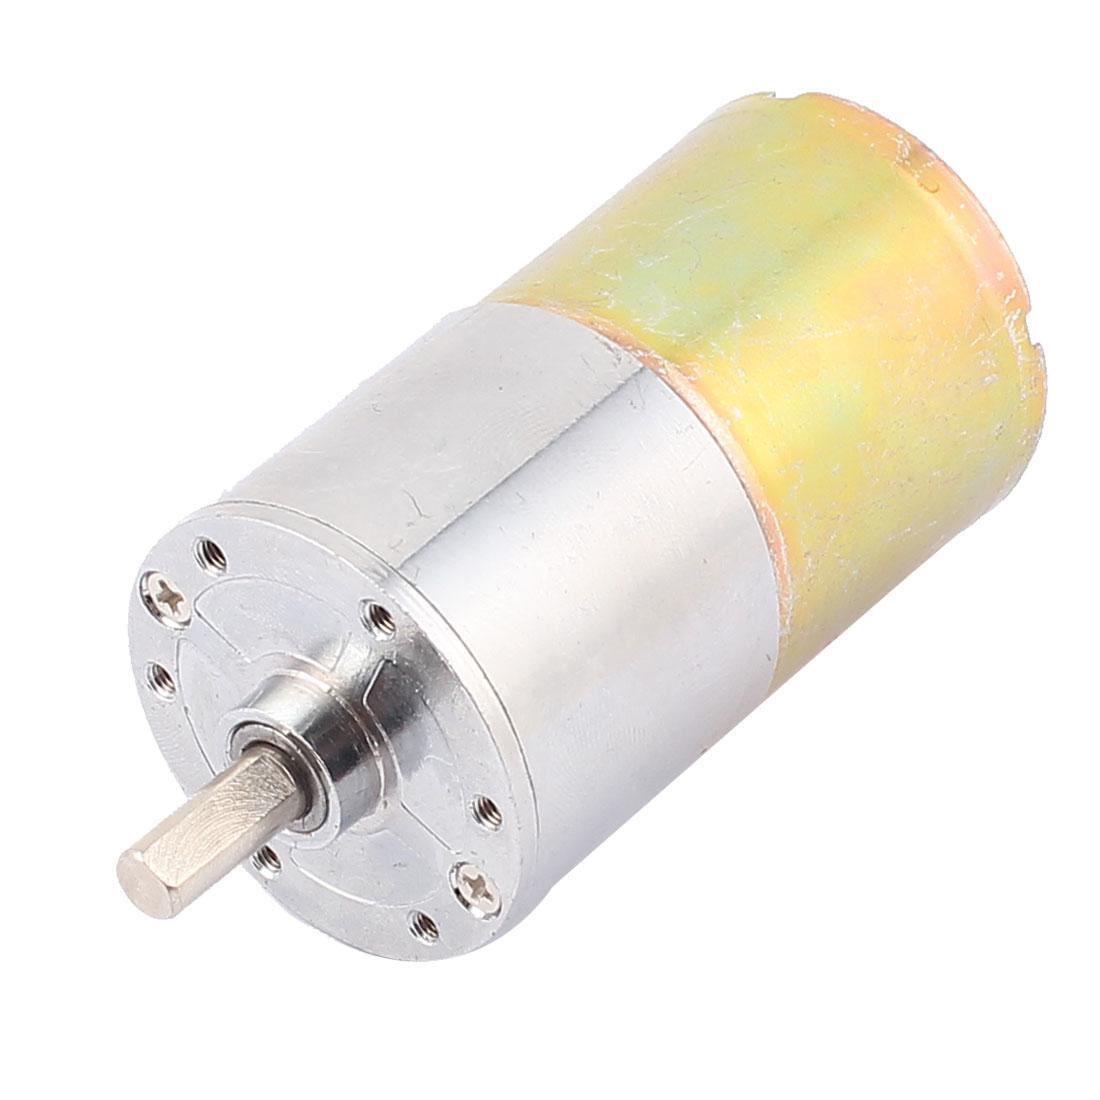 DC 12V 10RPM 6mm Shaft Dia Speed Reducing Gear Box Motor